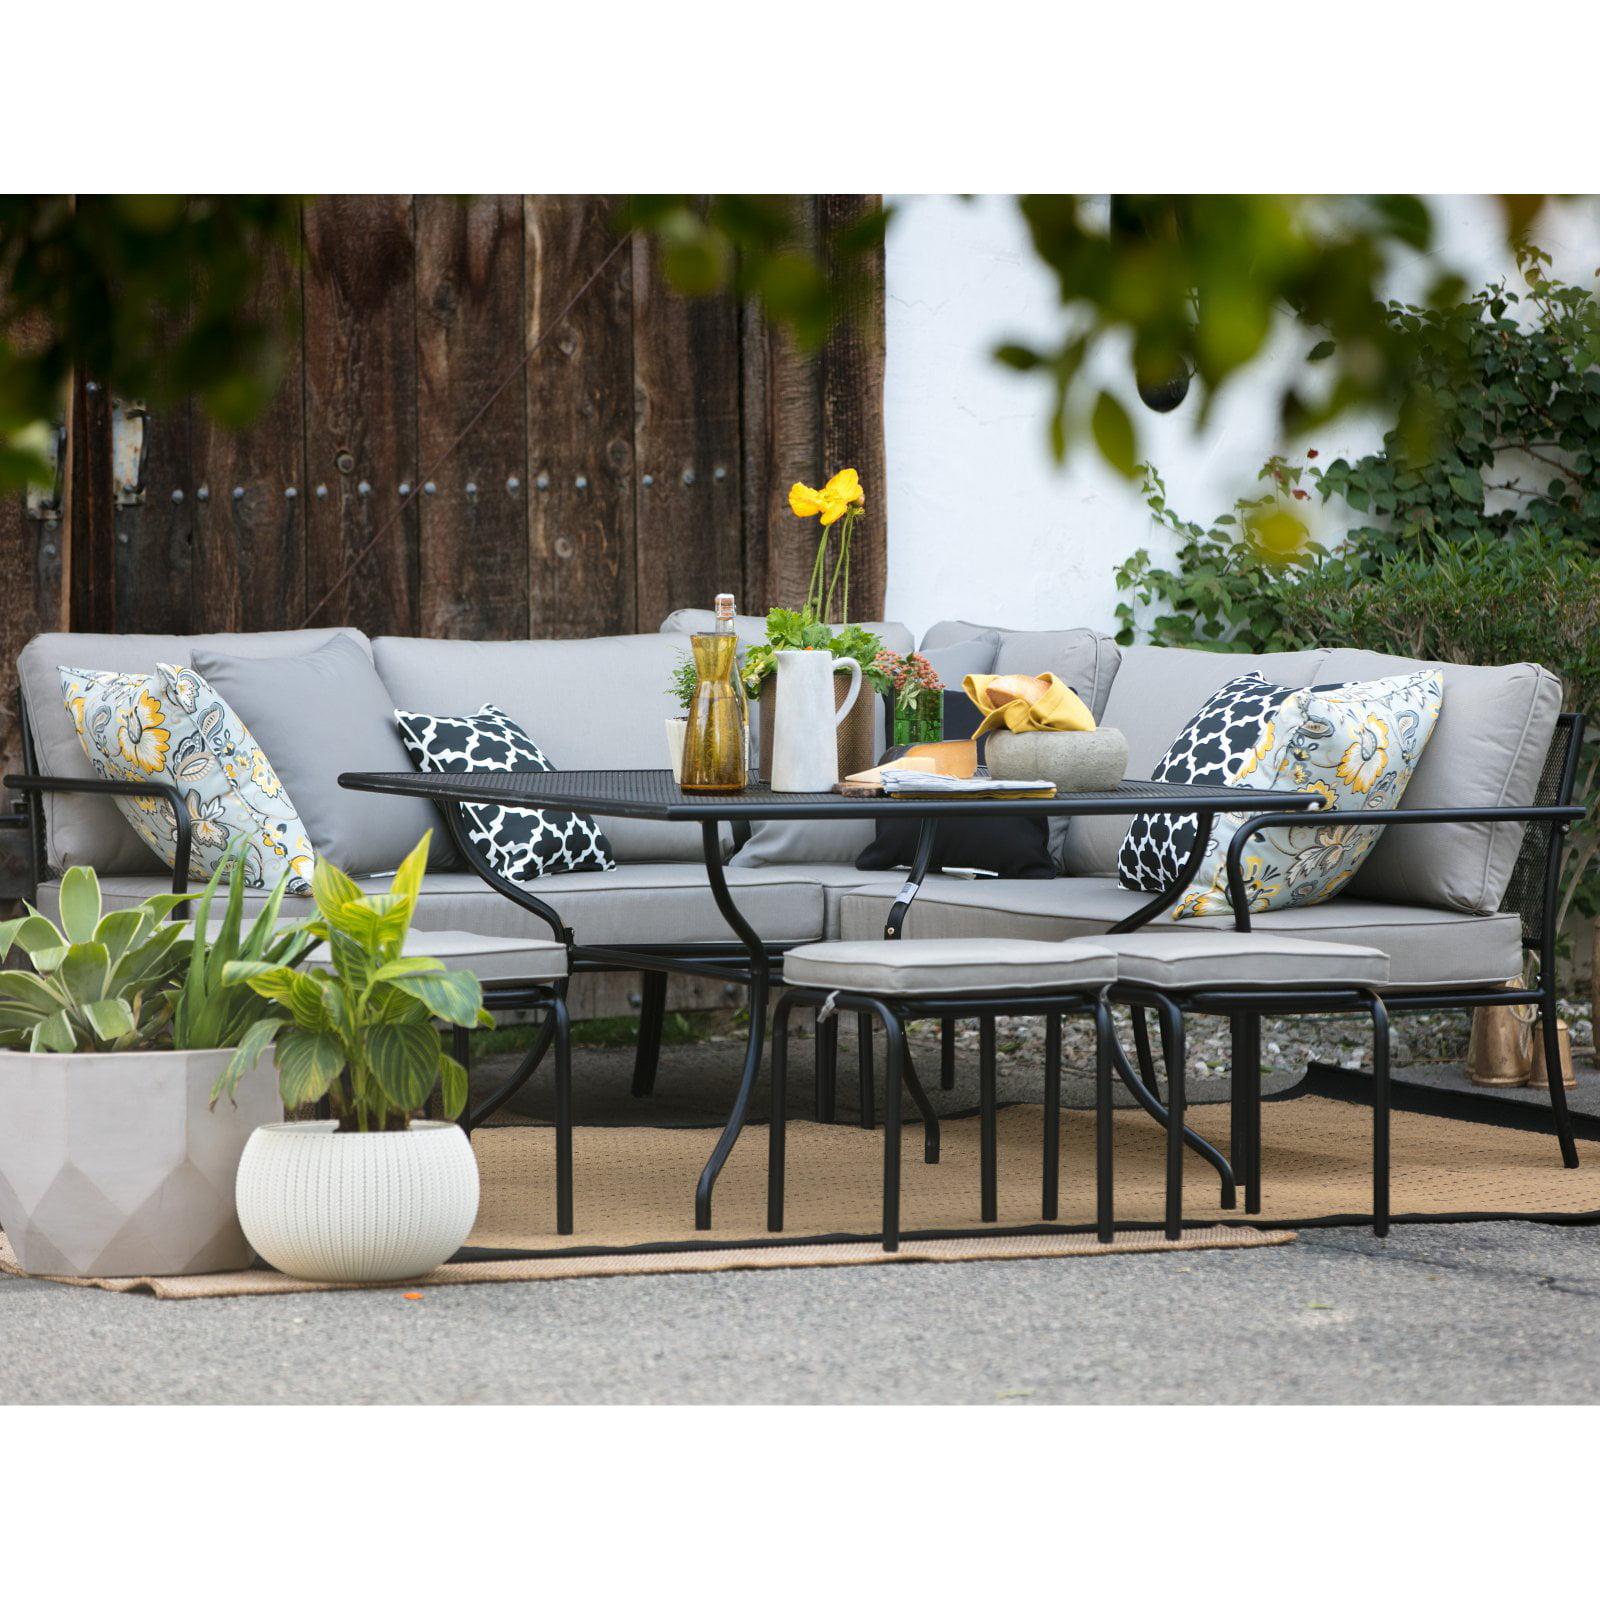 Belham Living Parkville Metal Sofa Sectional Patio Dining Set